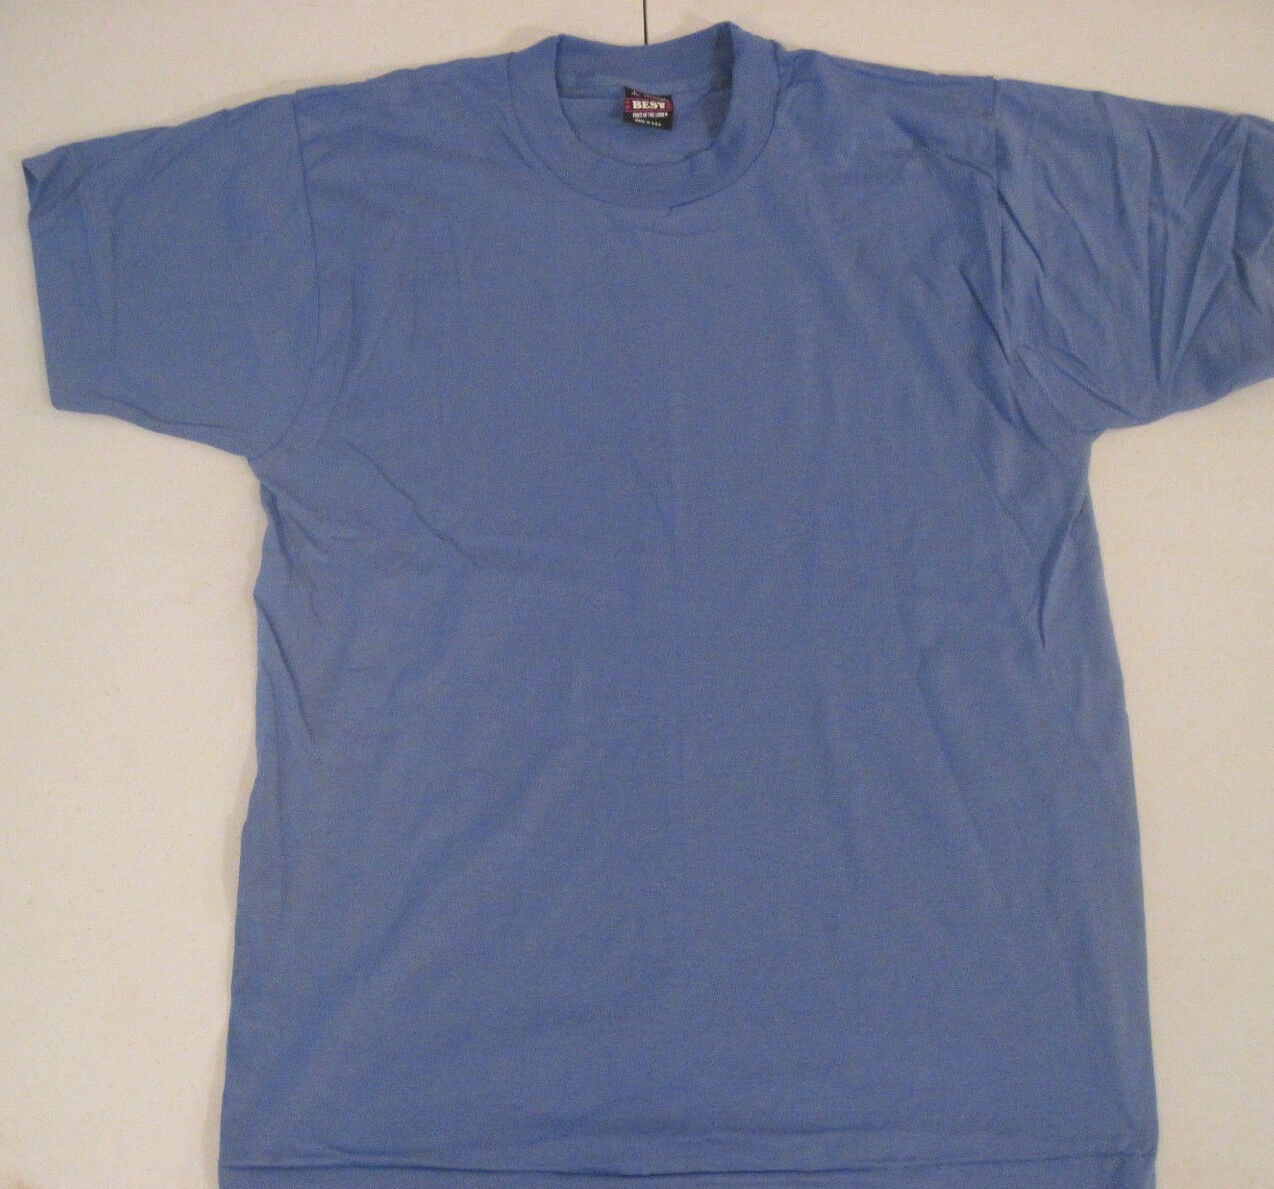 Vintage Fruit Of The Loom Best T-Shirt Blank Size Large Blue